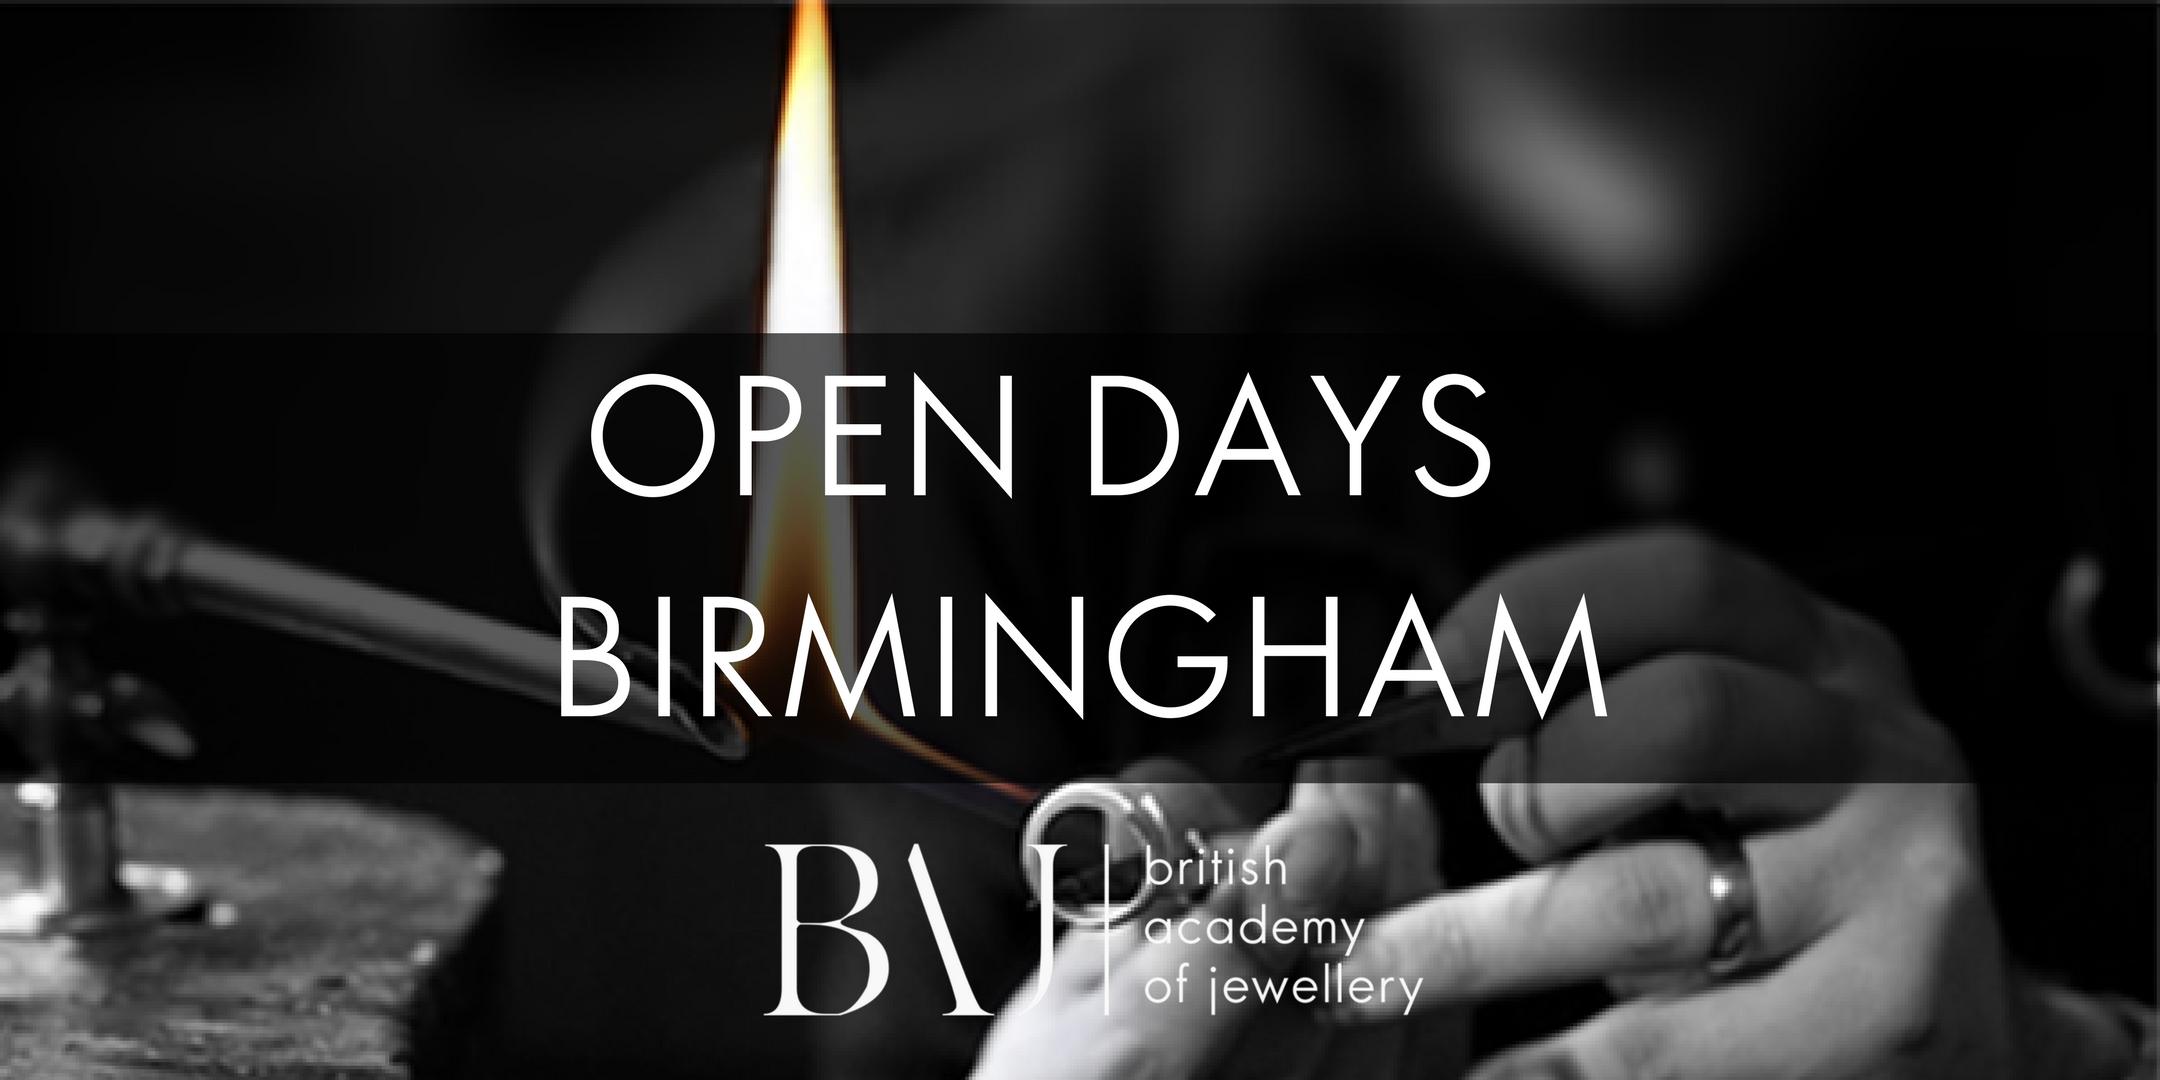 British Academy of Jewellery Birmingham Open